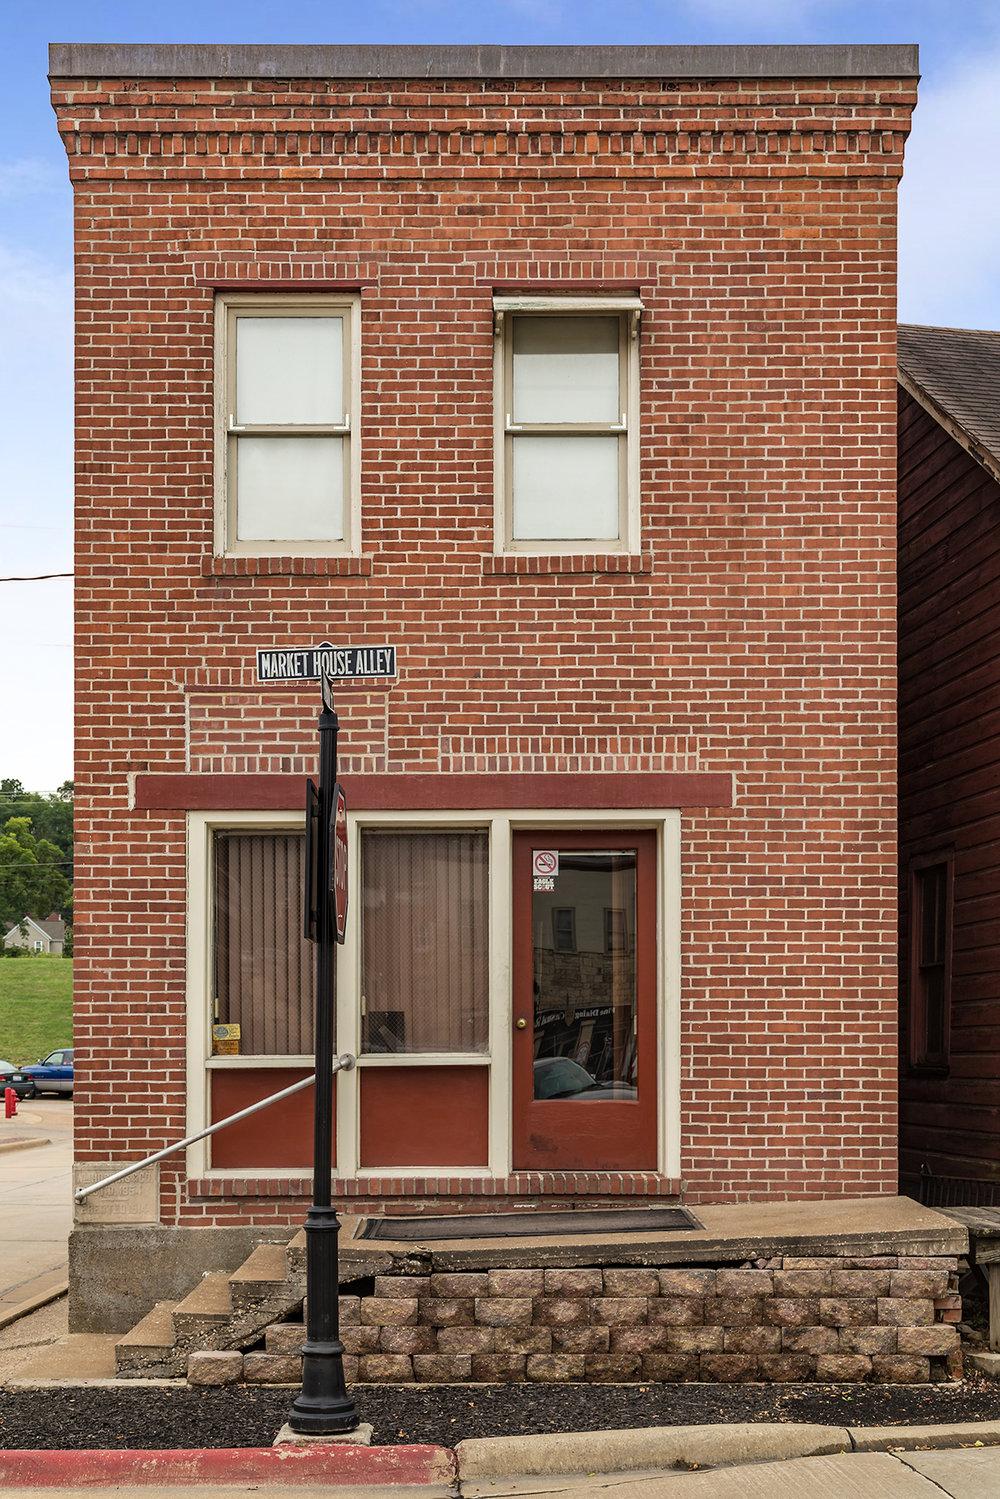 Wm. Hoskins building, Galena, IL